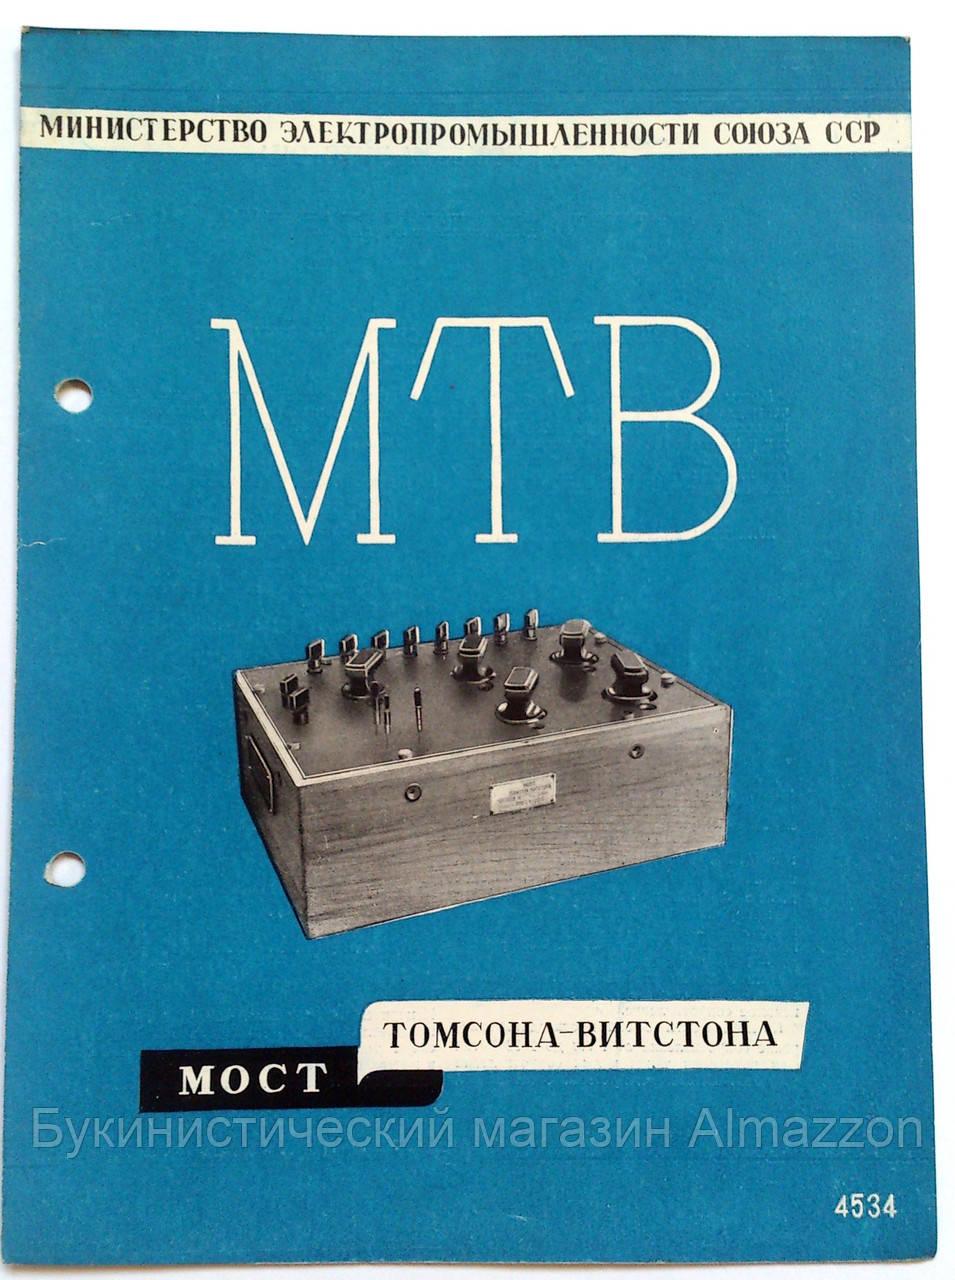 "Журнал (Бюллетень) ""Мост Томсона-Витстона МТВ"" 1949 год"